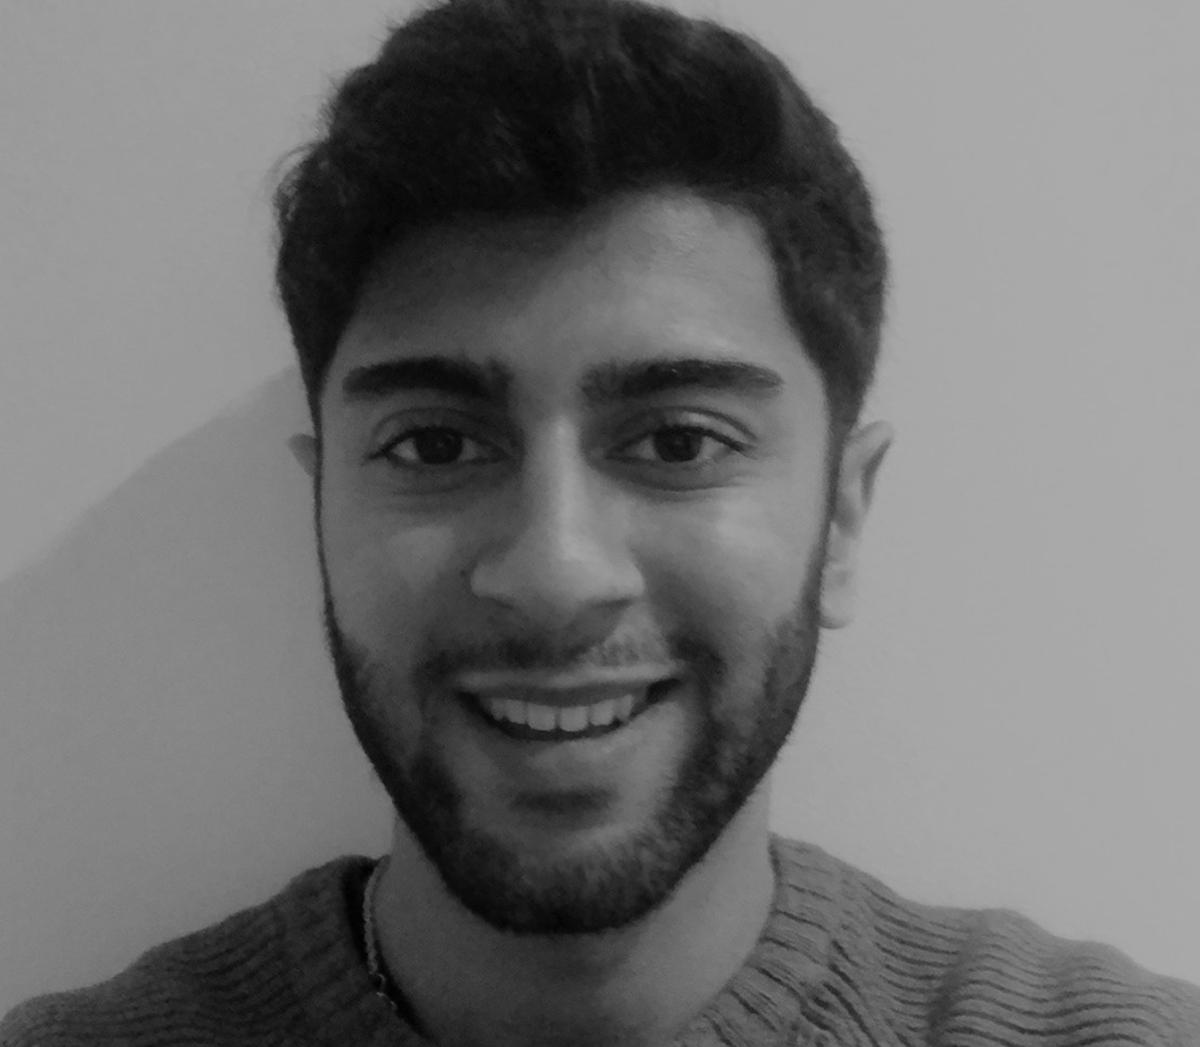 https://flossandsmile.co.uk/wp-content/uploads/2021/02/Floss-and-Smile_team-09.png